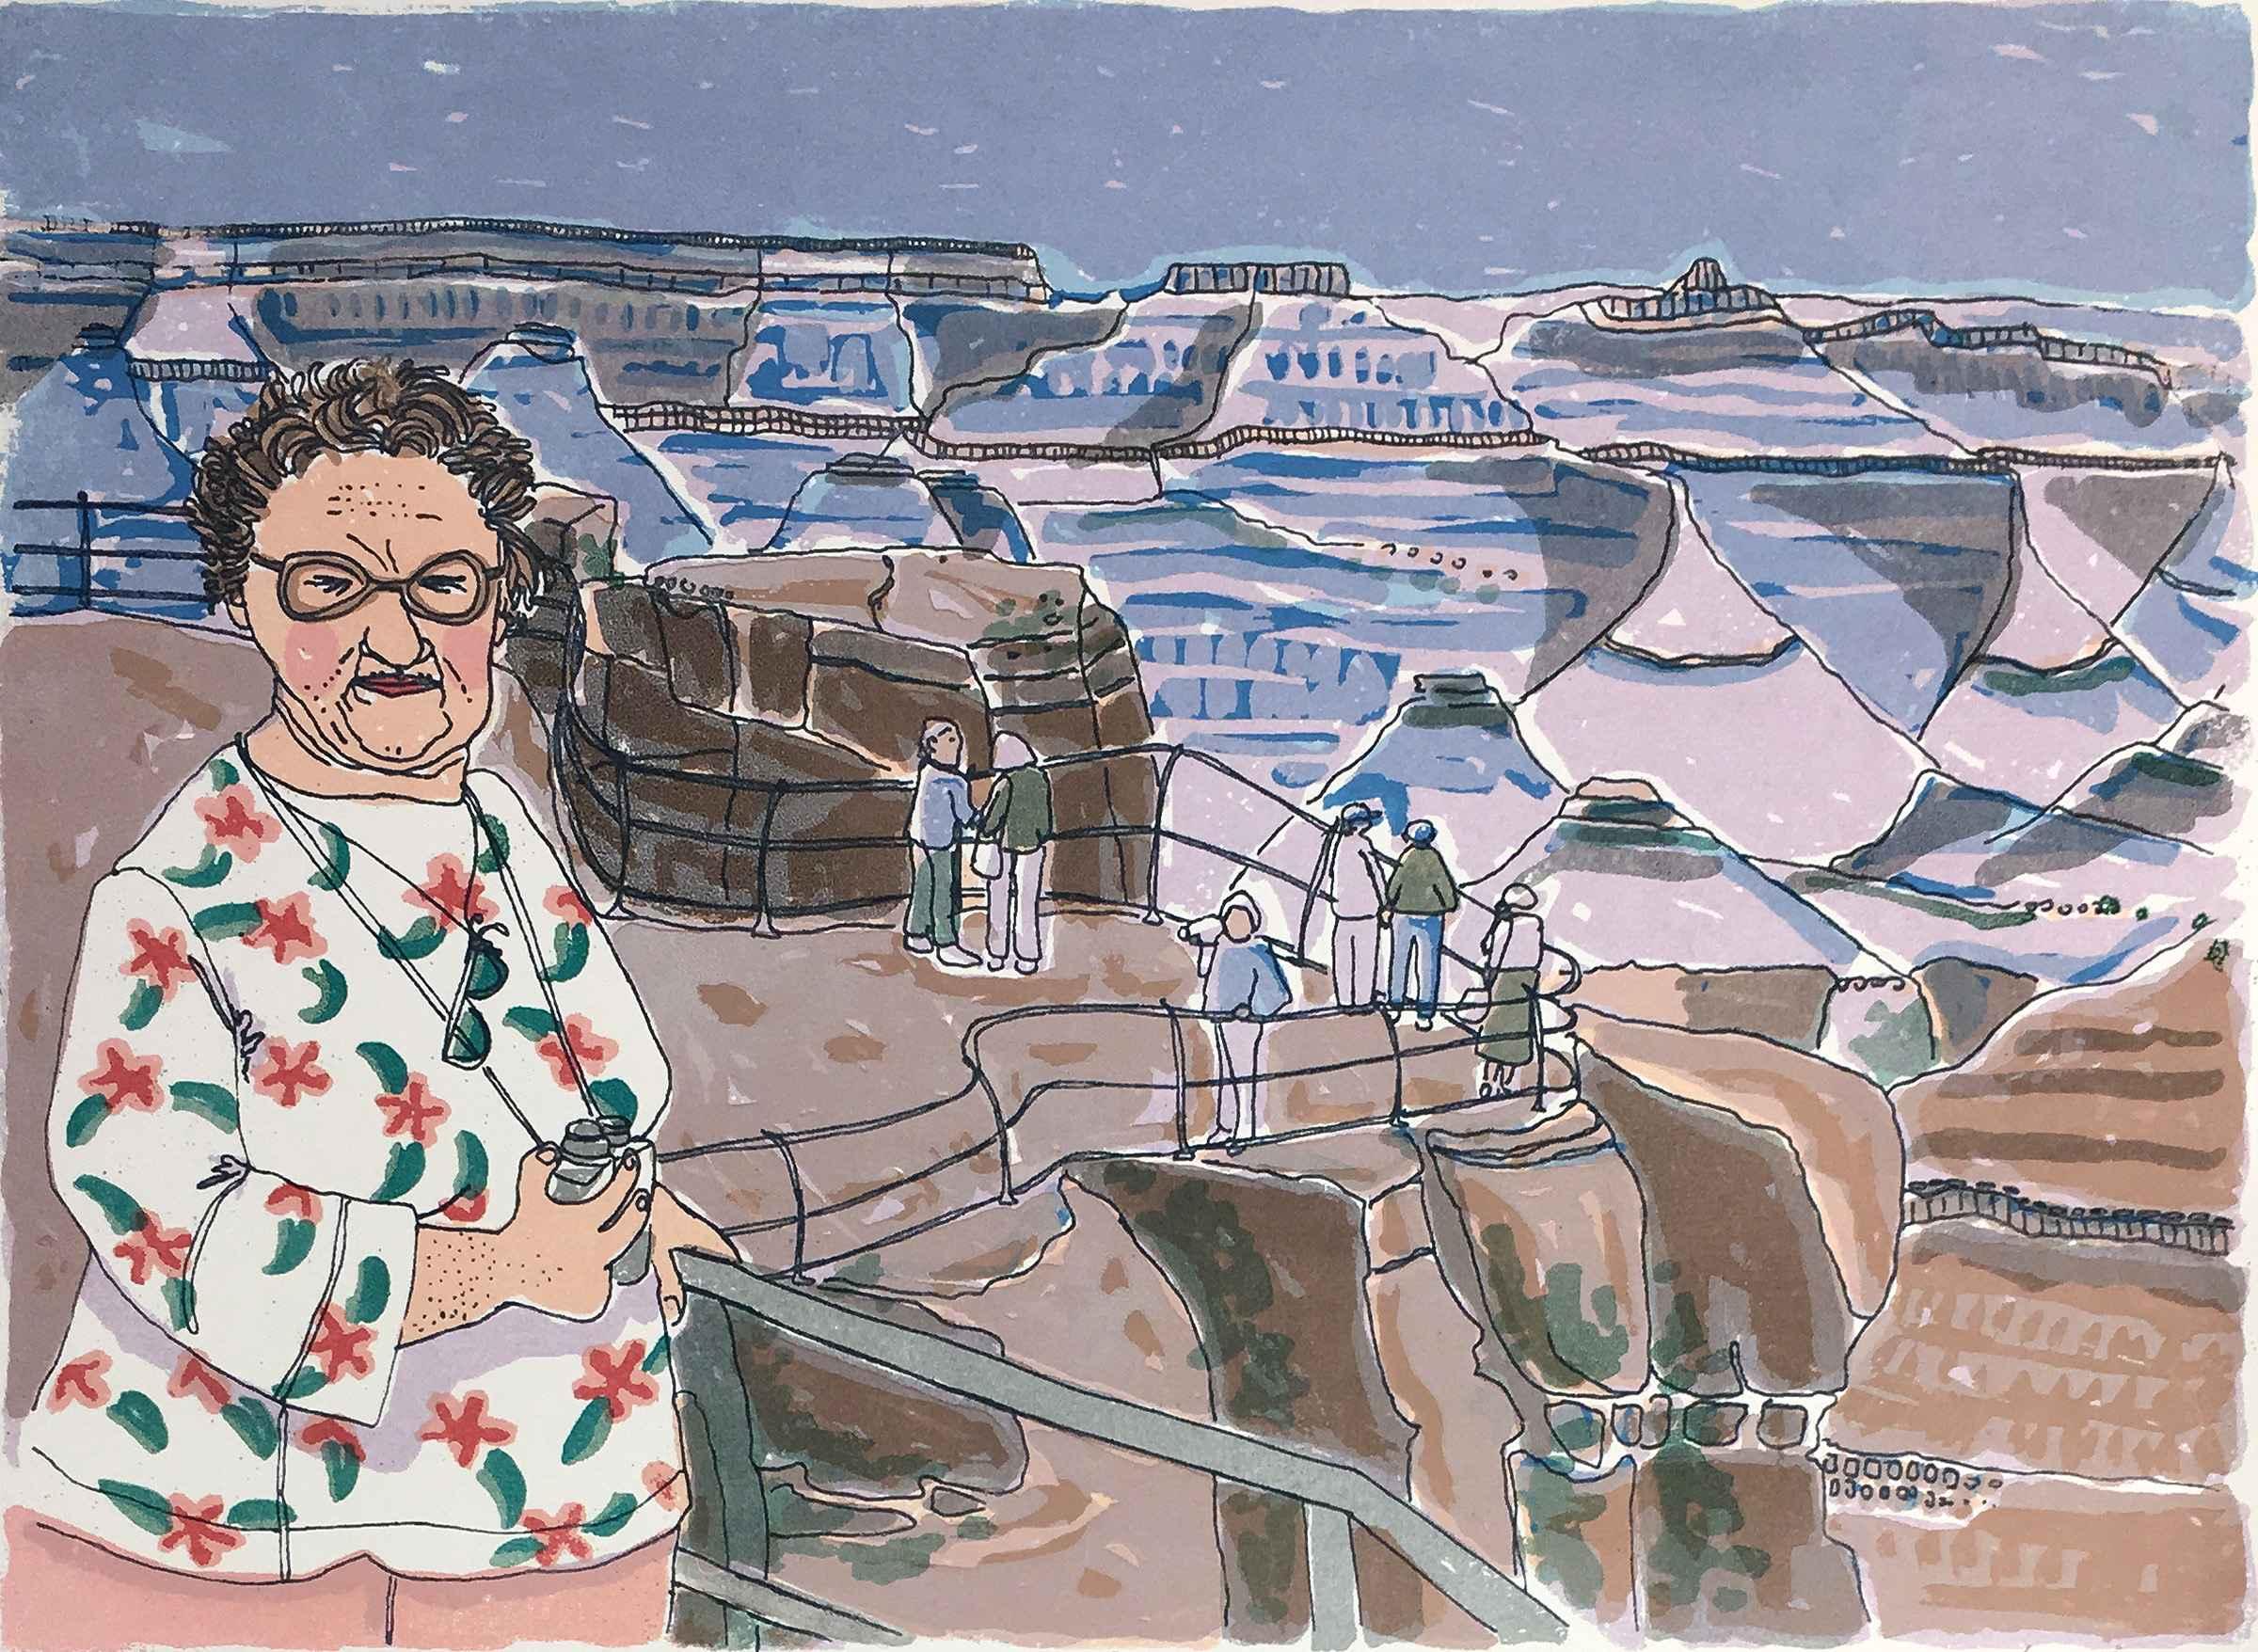 Wanda at 7200 Ft. by  Ann L. Carter - Masterpiece Online